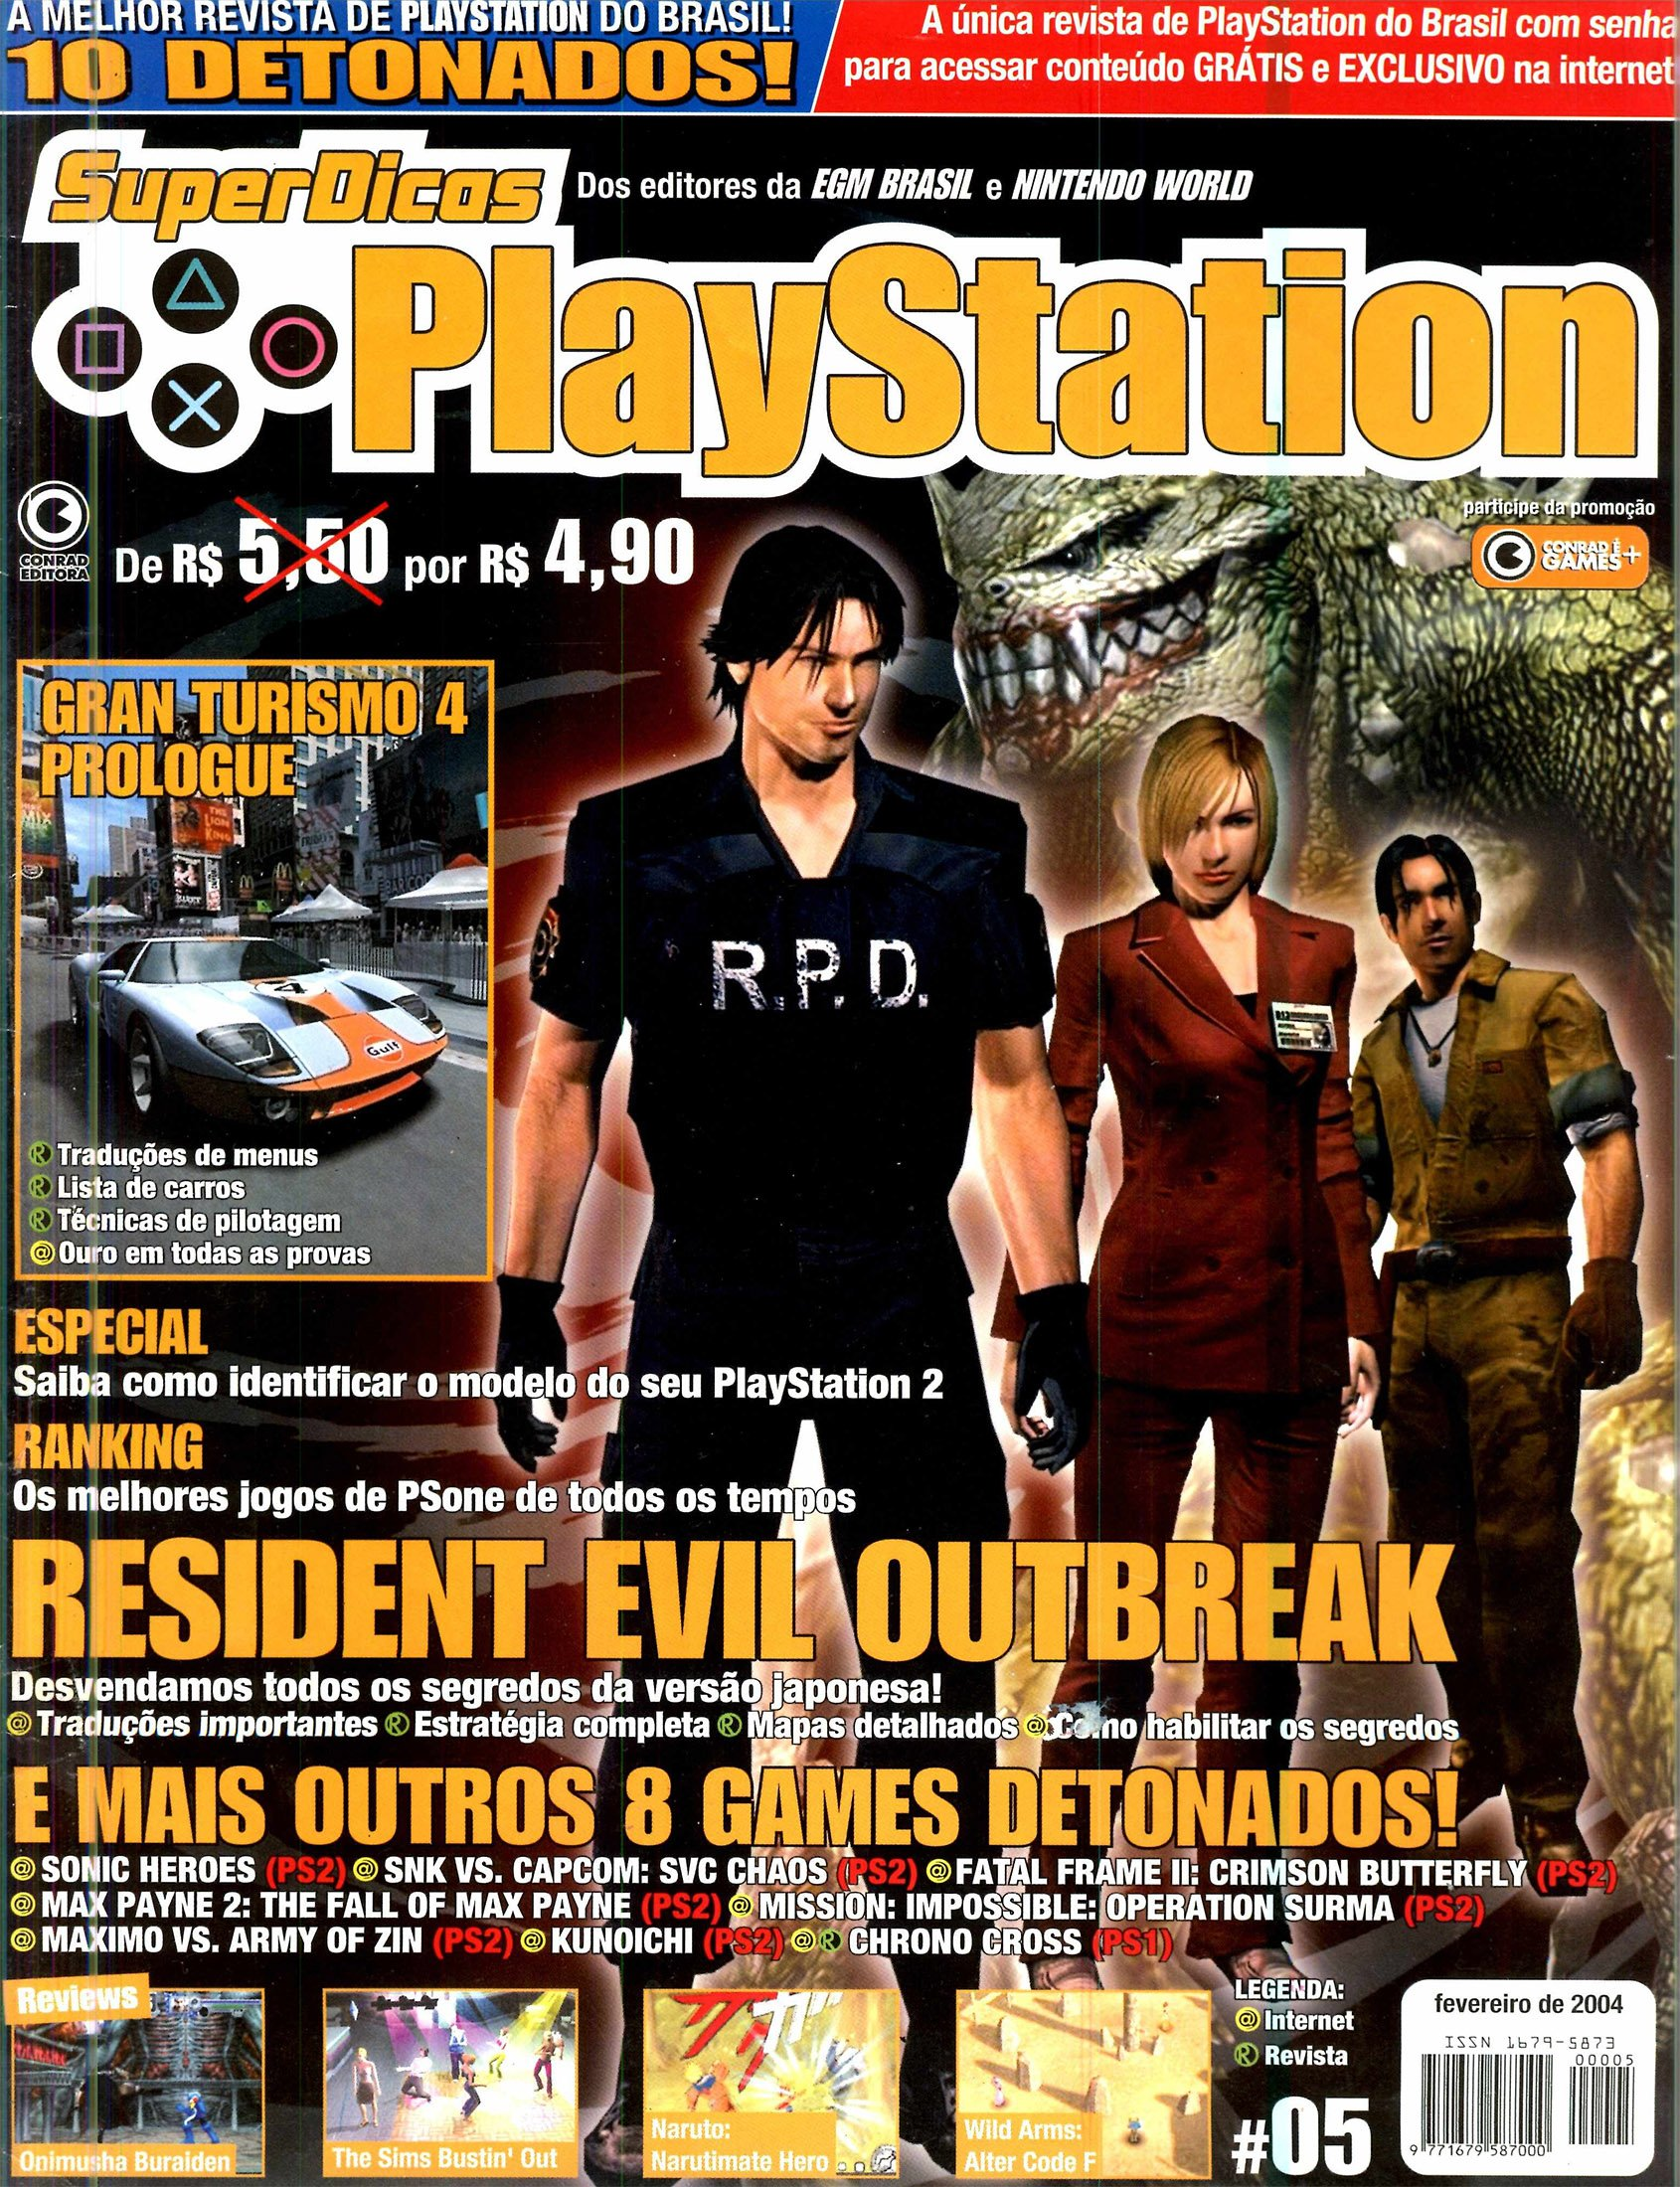 Super Dicas Playstation 05 (February 2004)